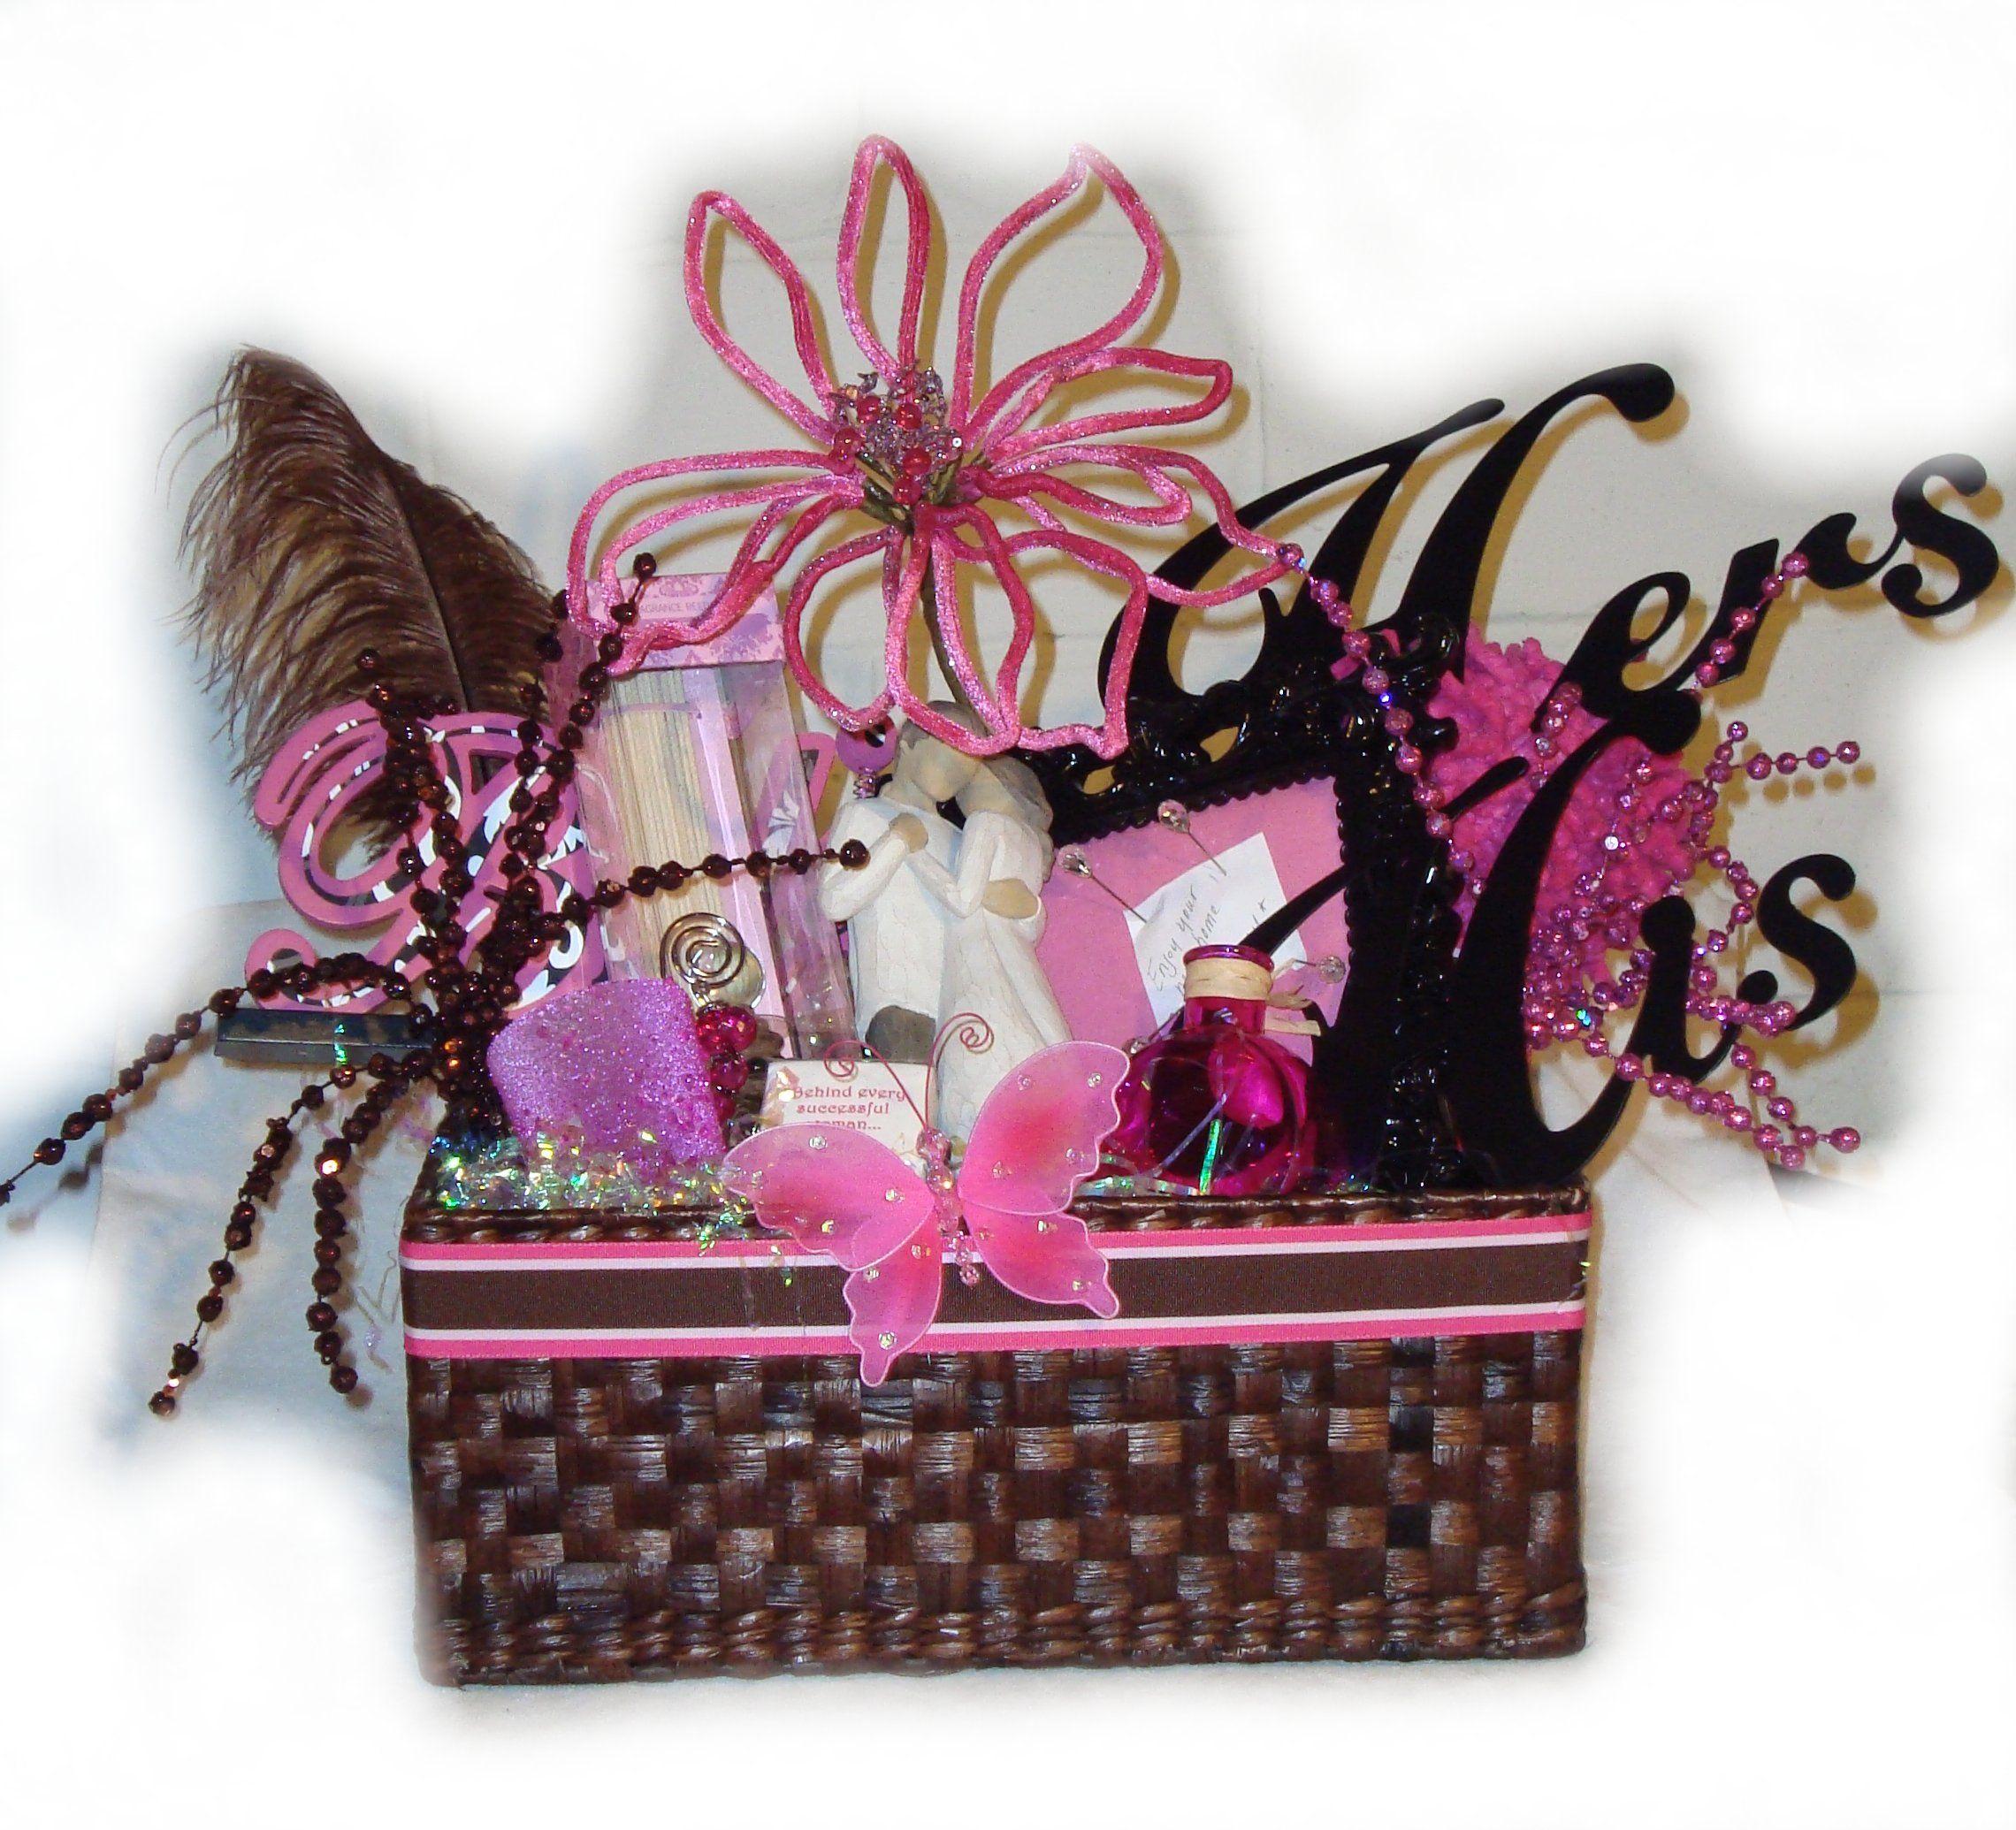 Blingtastic baskets raffle baskets gift baskets